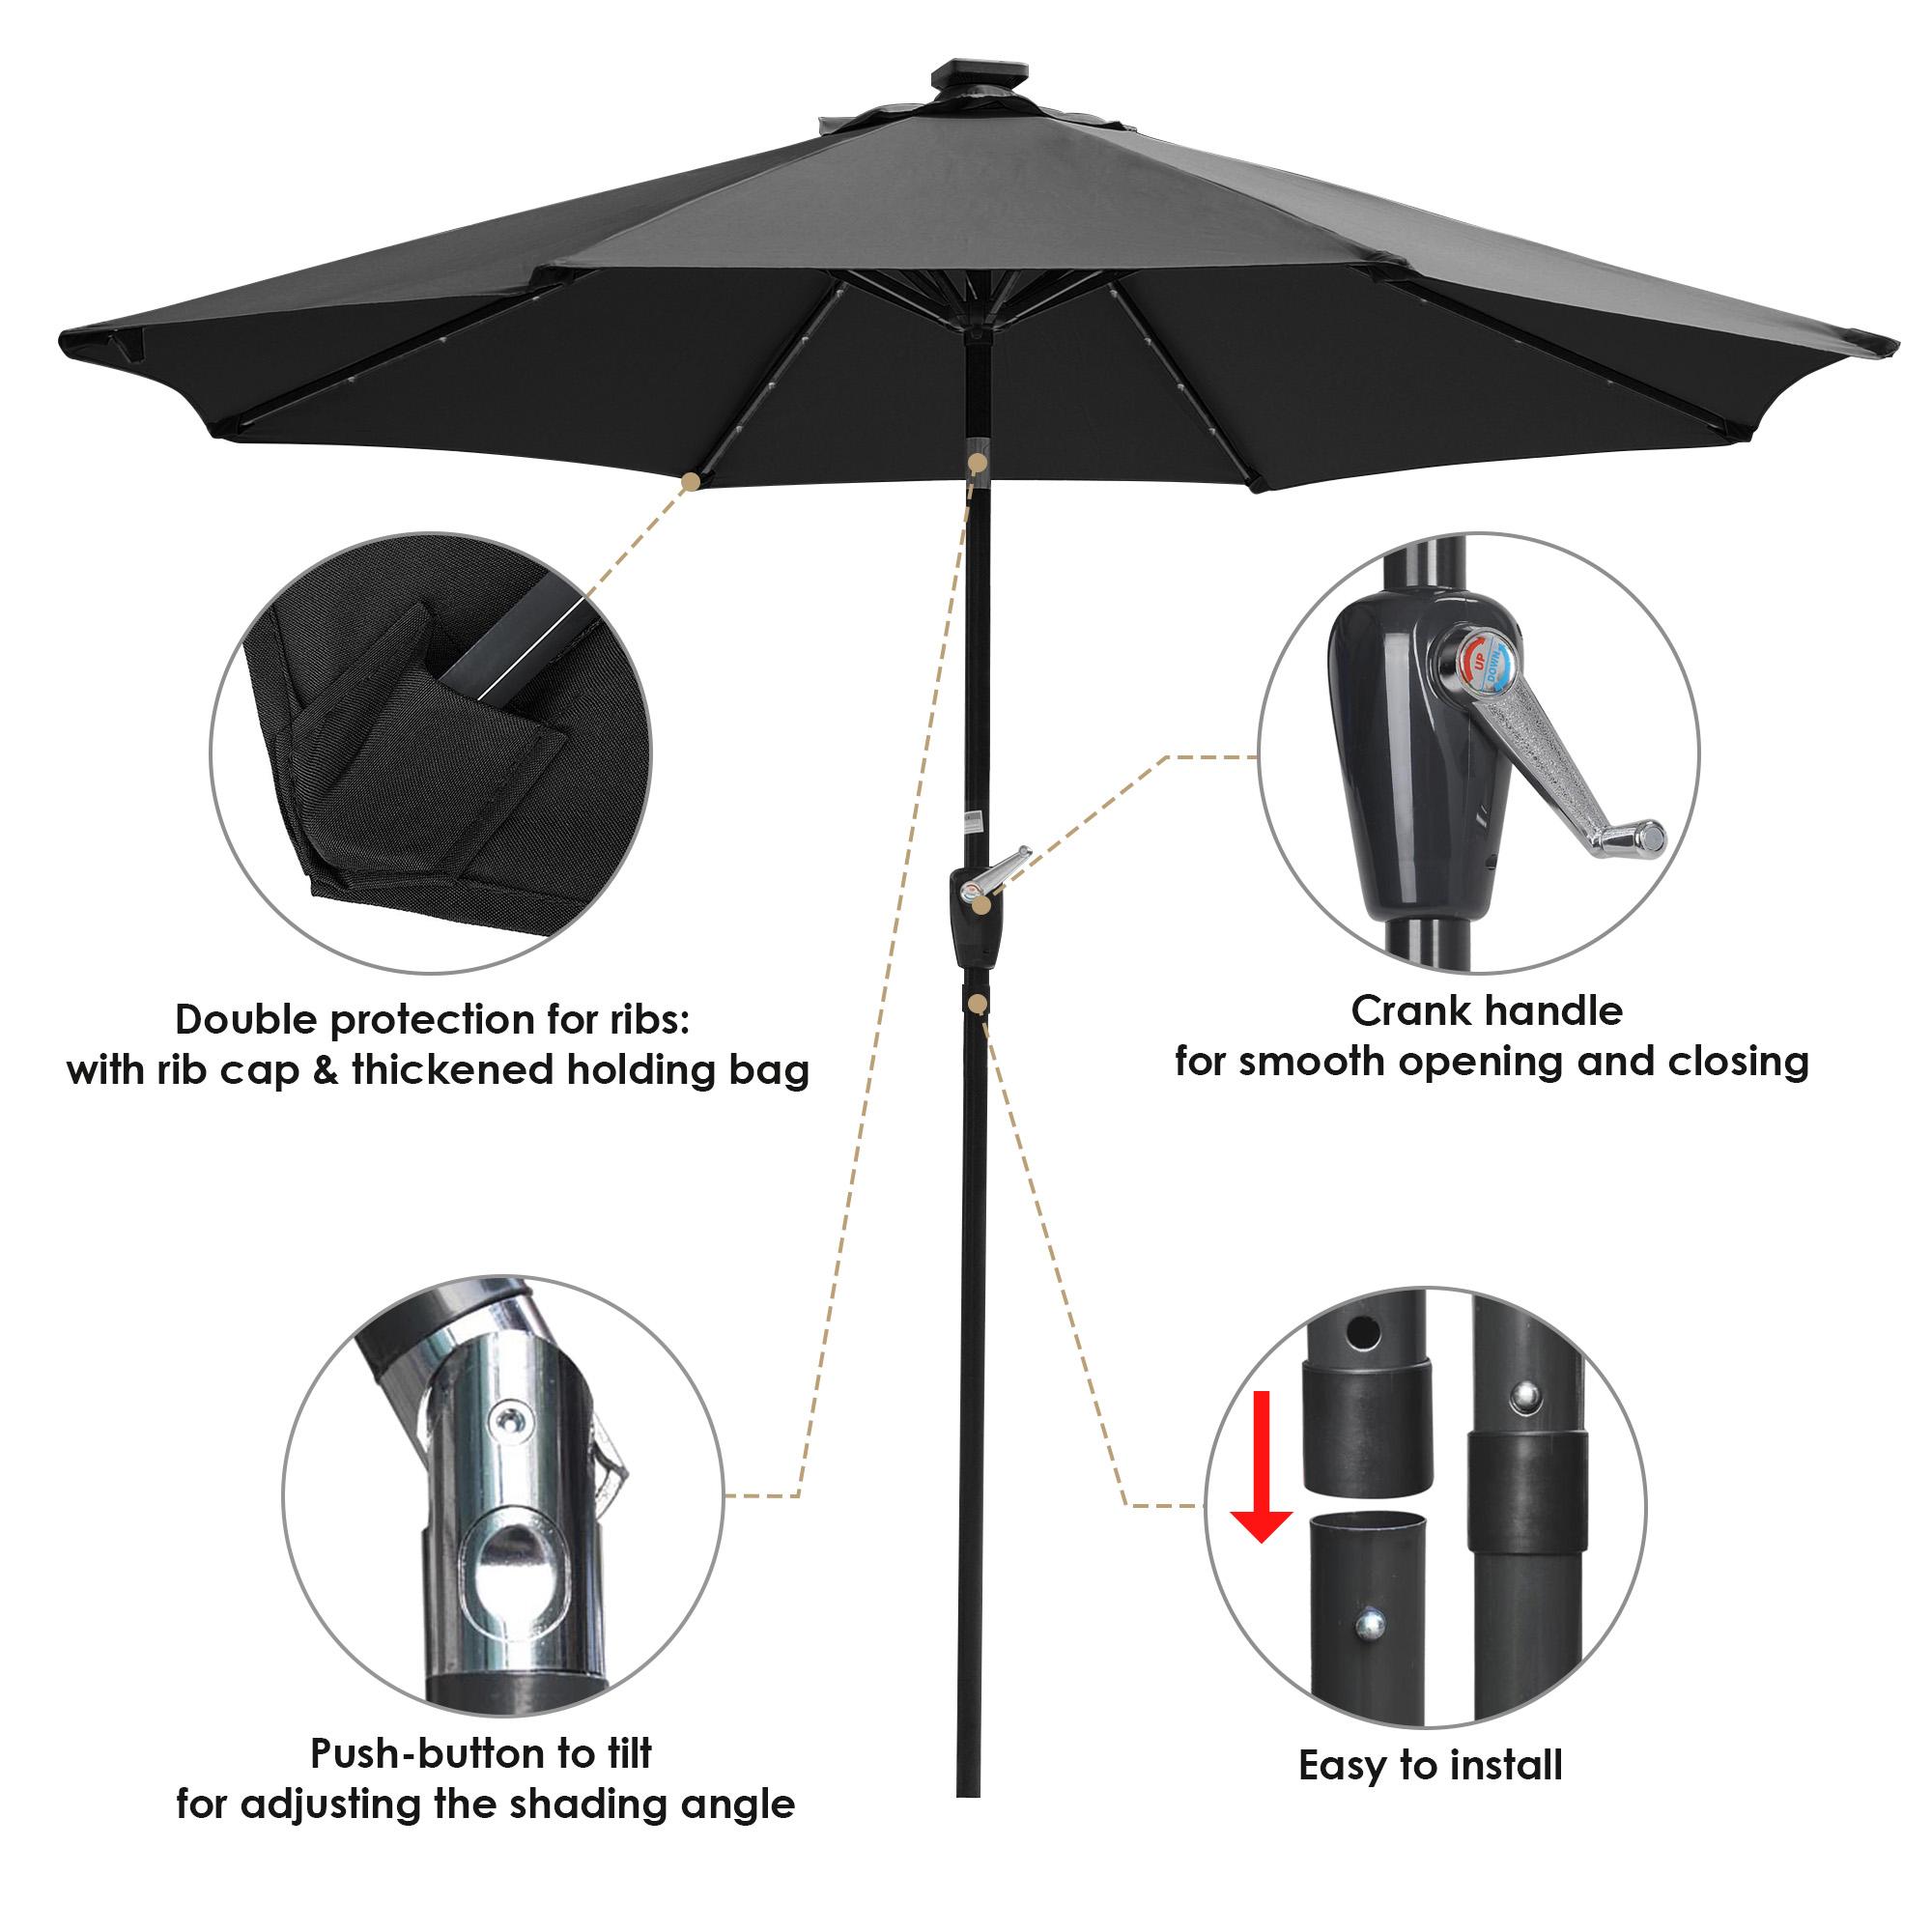 thumbnail 38 - 9' Patio Outdoor Umbrella Solar LED 8 Rib Garden Parasol Yard Deck Table Shade